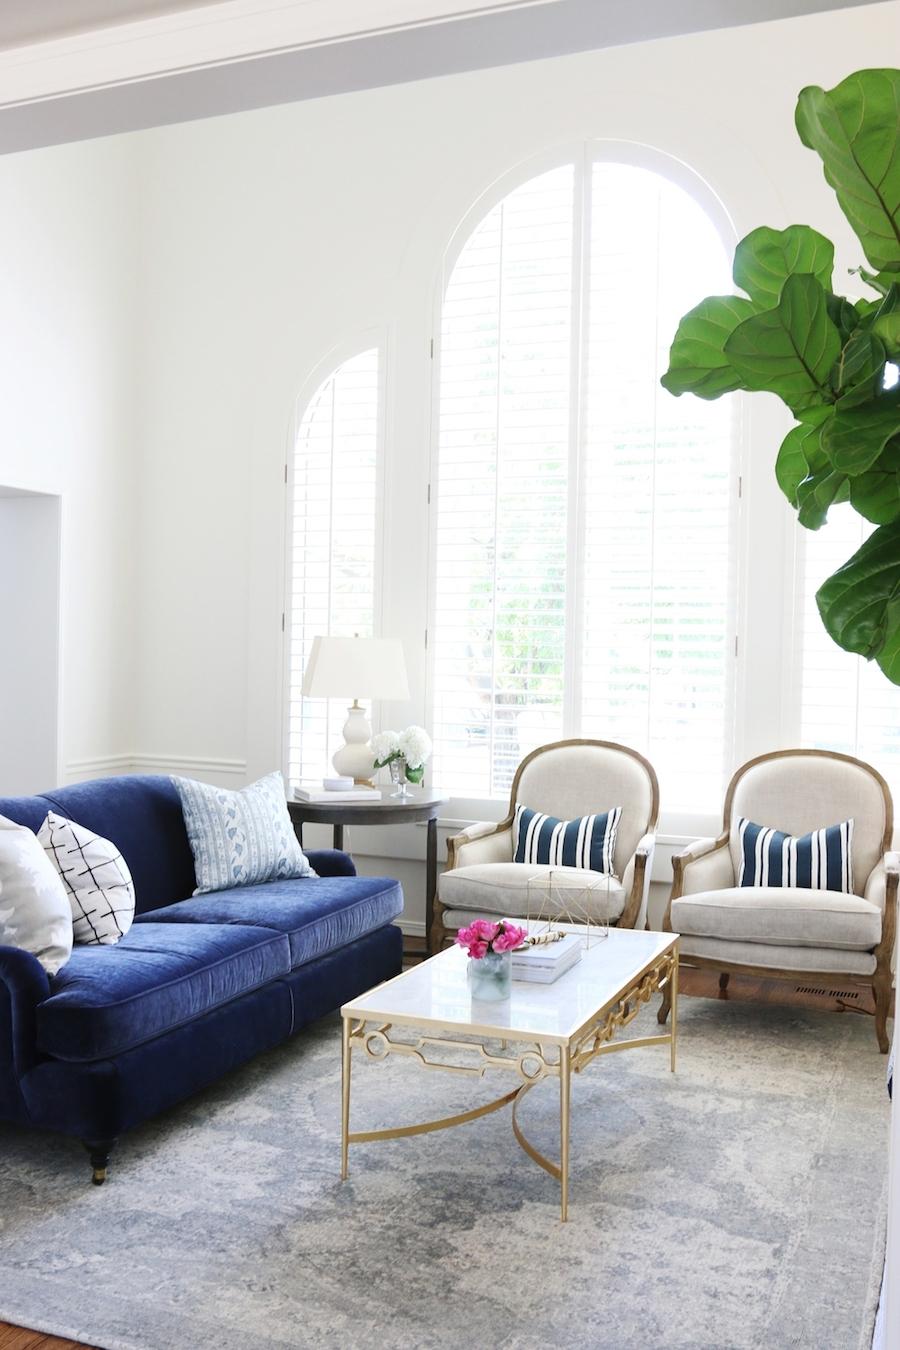 Best And Newest Velvet Sofas Intended For 25 Stunning Living Rooms With Blue Velvet Sofas (View 1 of 20)